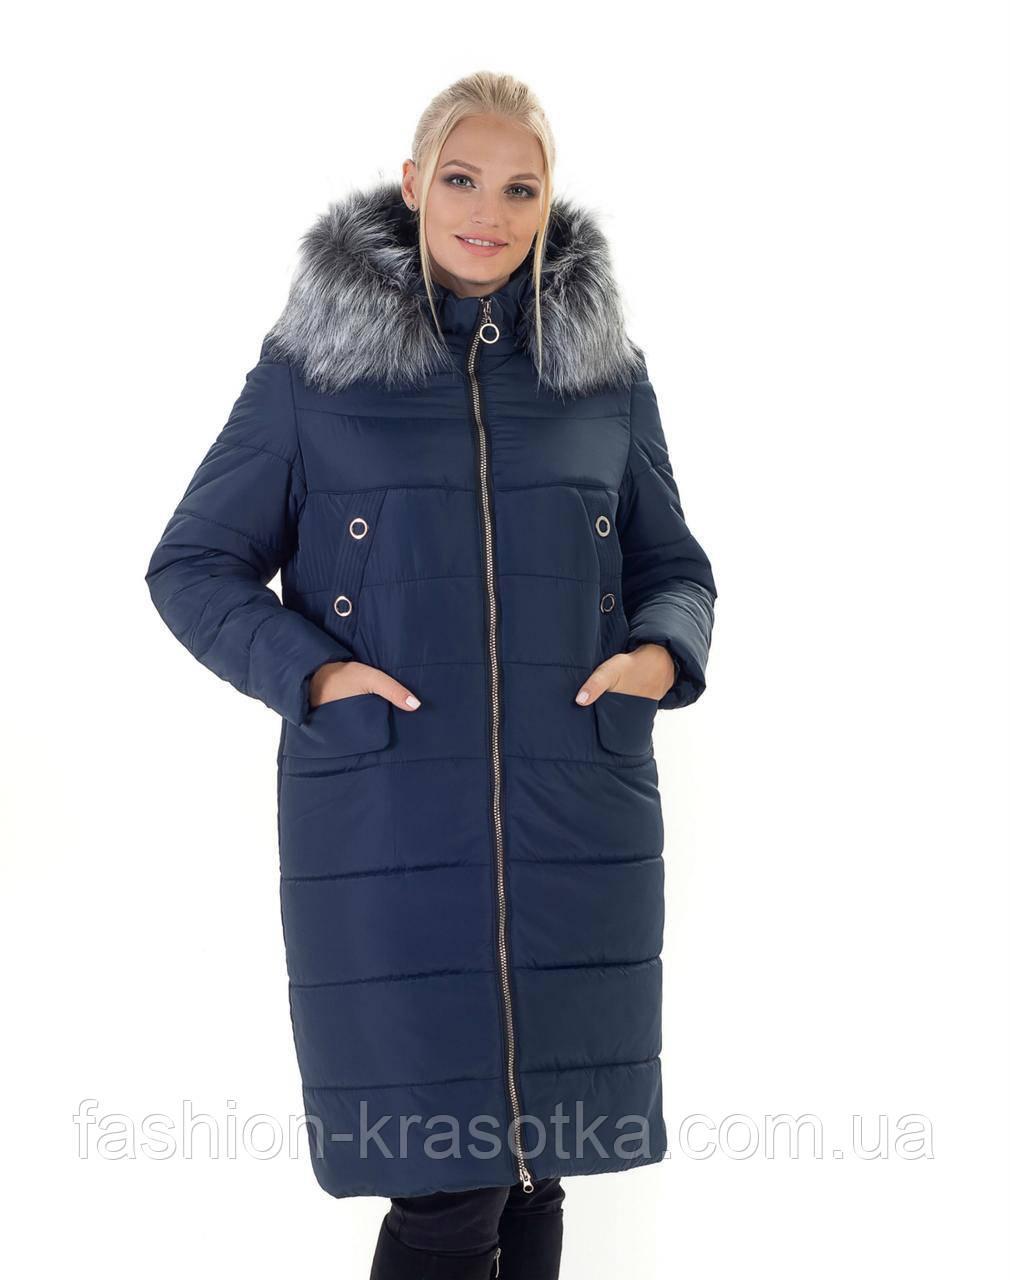 Зимний женский  теплый пуховик,размеры:44-60.